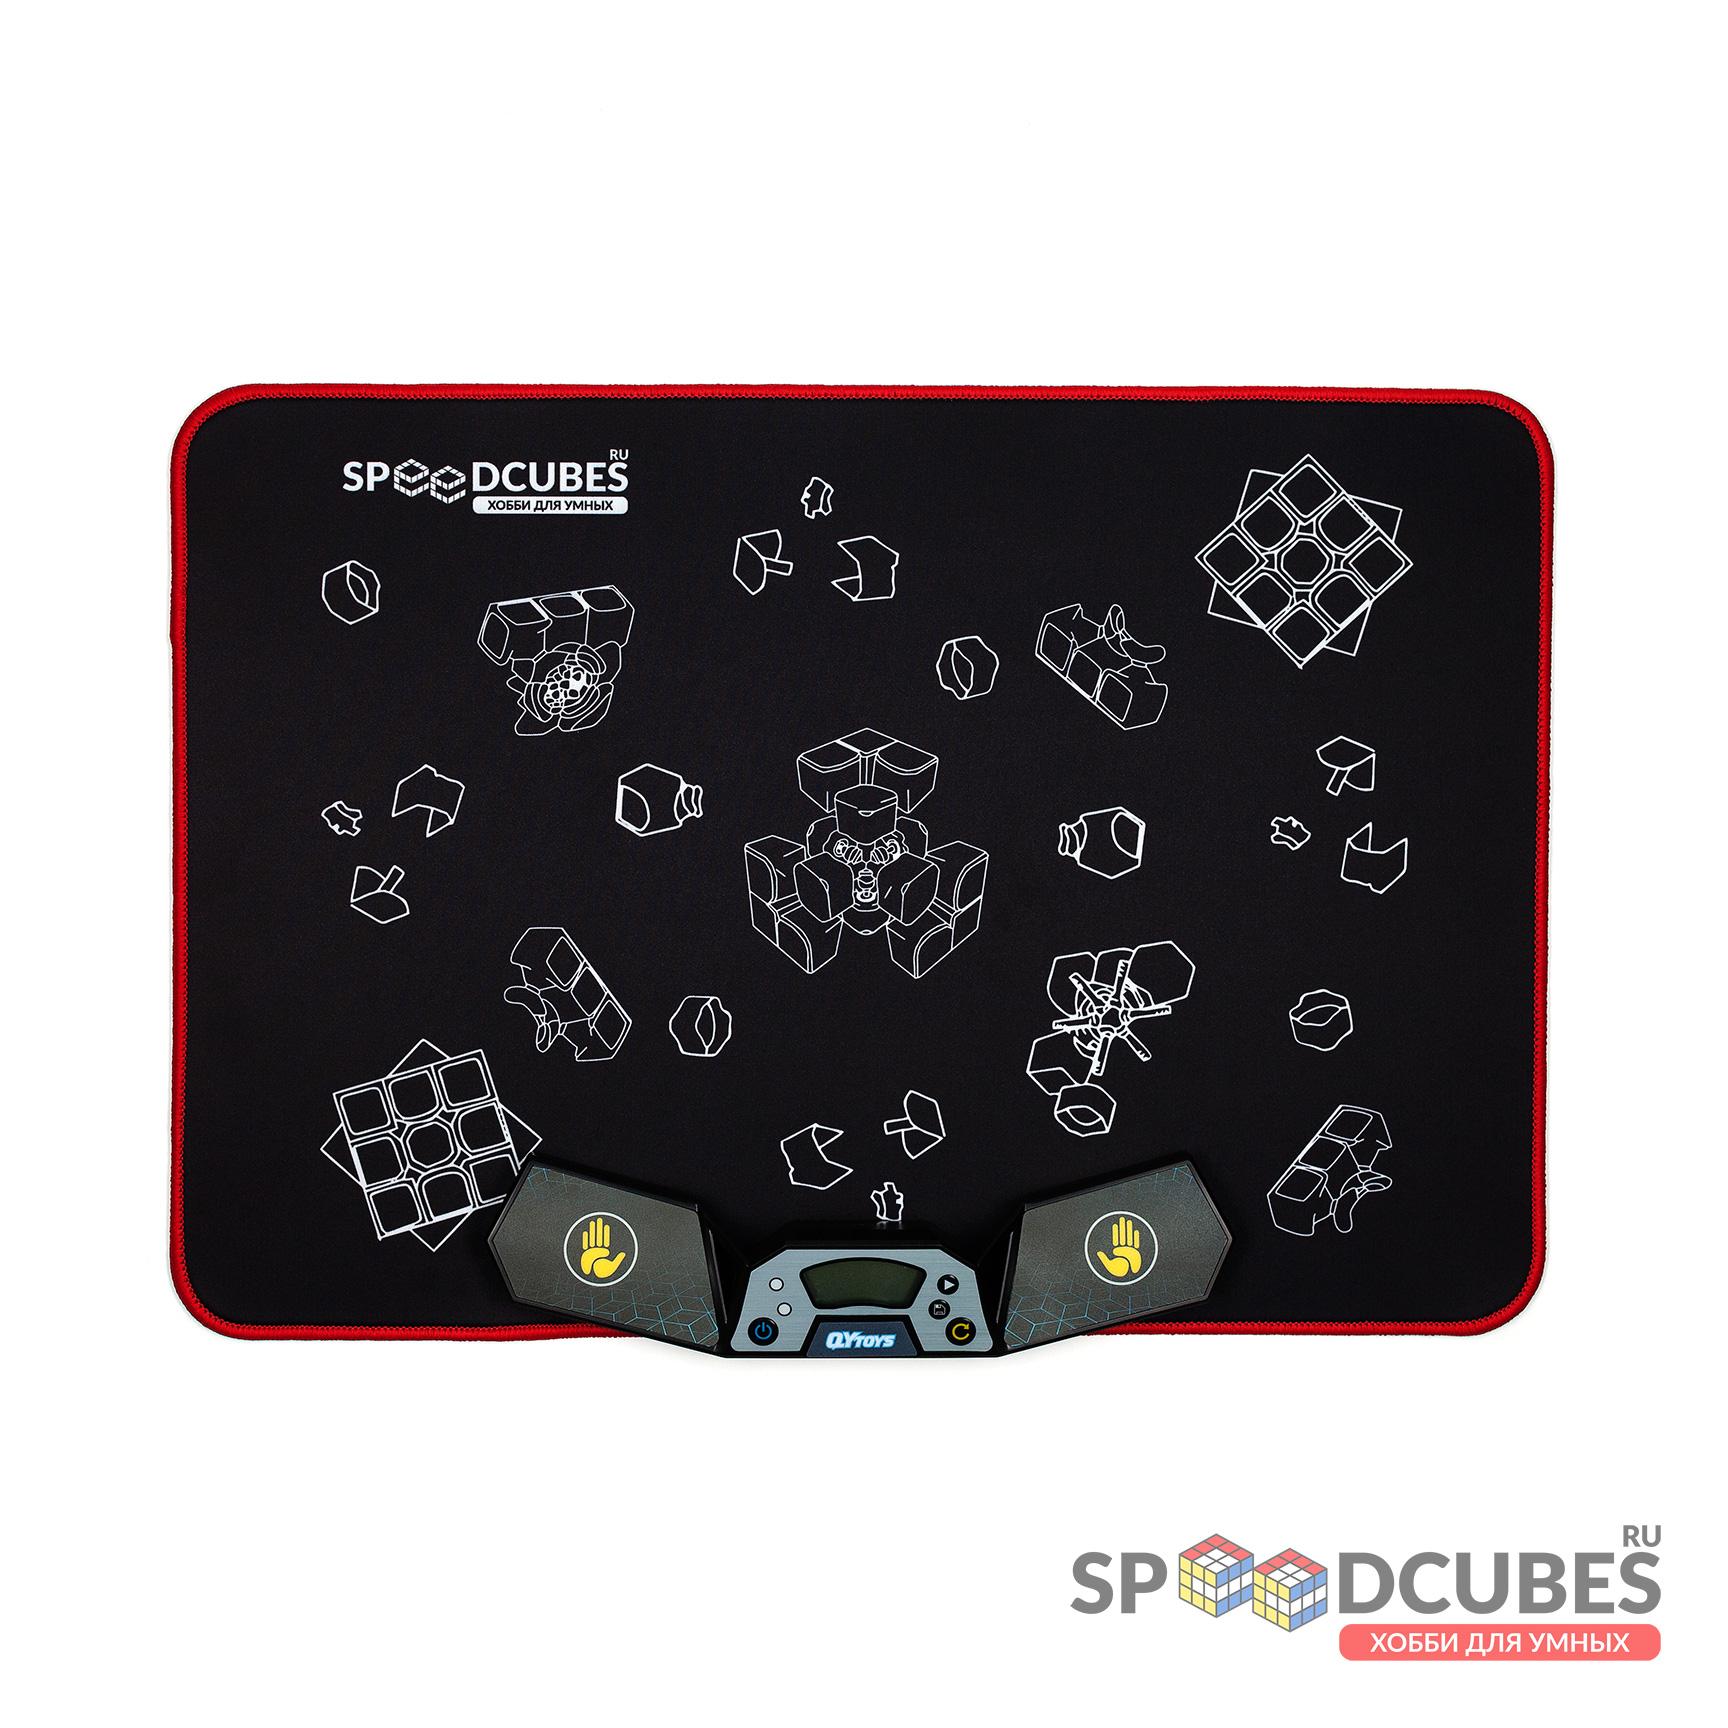 SPEEDCUBES комплект мат и QiYi (MoFangGe) таймер для спидкубинга